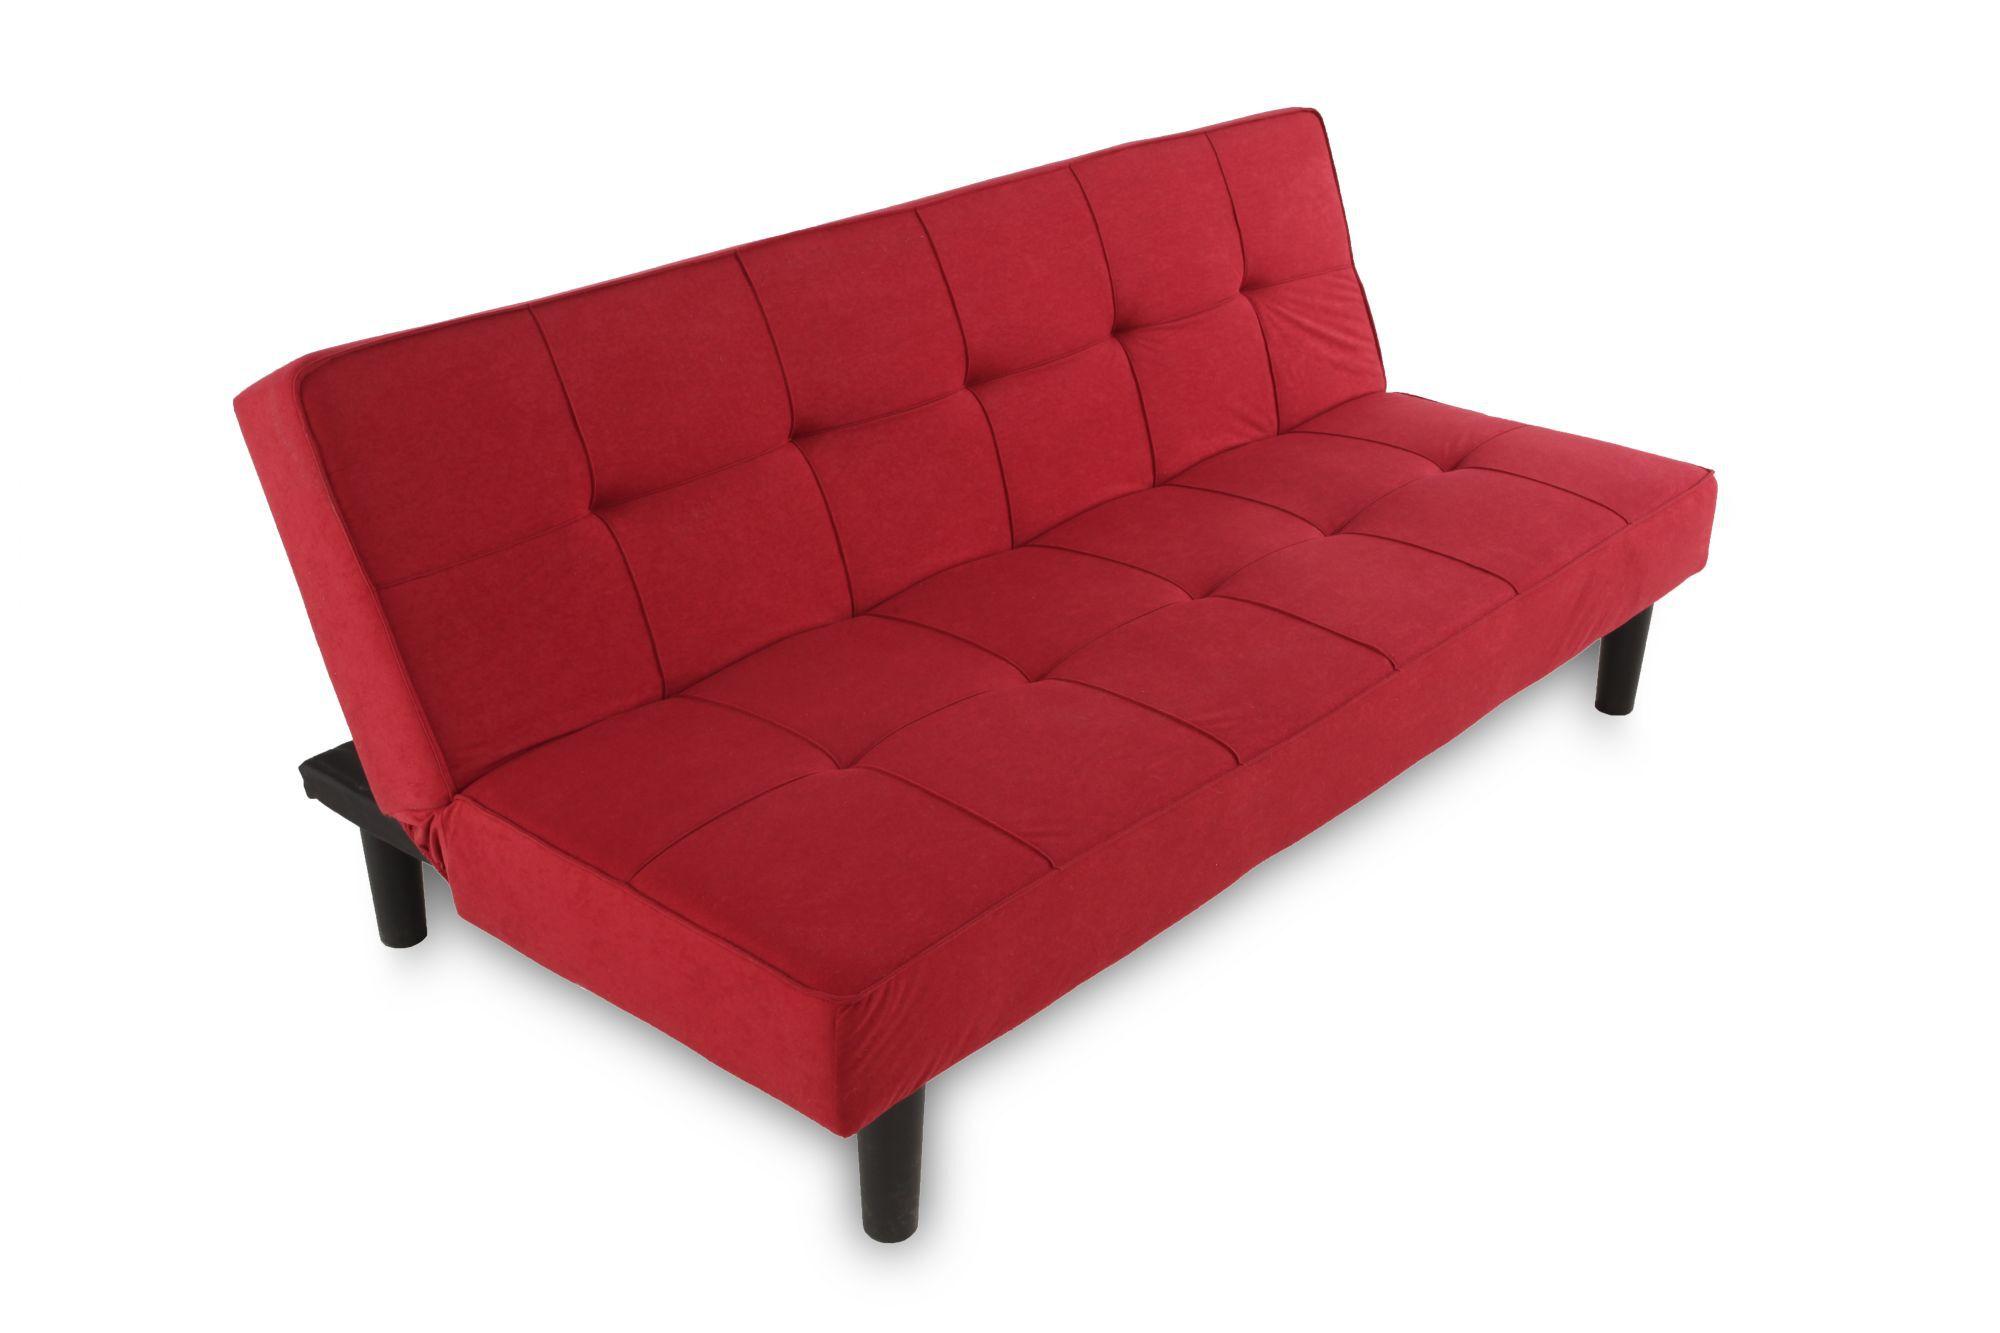 ashley furniture flip flop sofa flip flop sofa ashley furniture vito rh housepainting secondcompartment pw Roxanne Mocha Flip Flop ashley flip flop convertible sofa